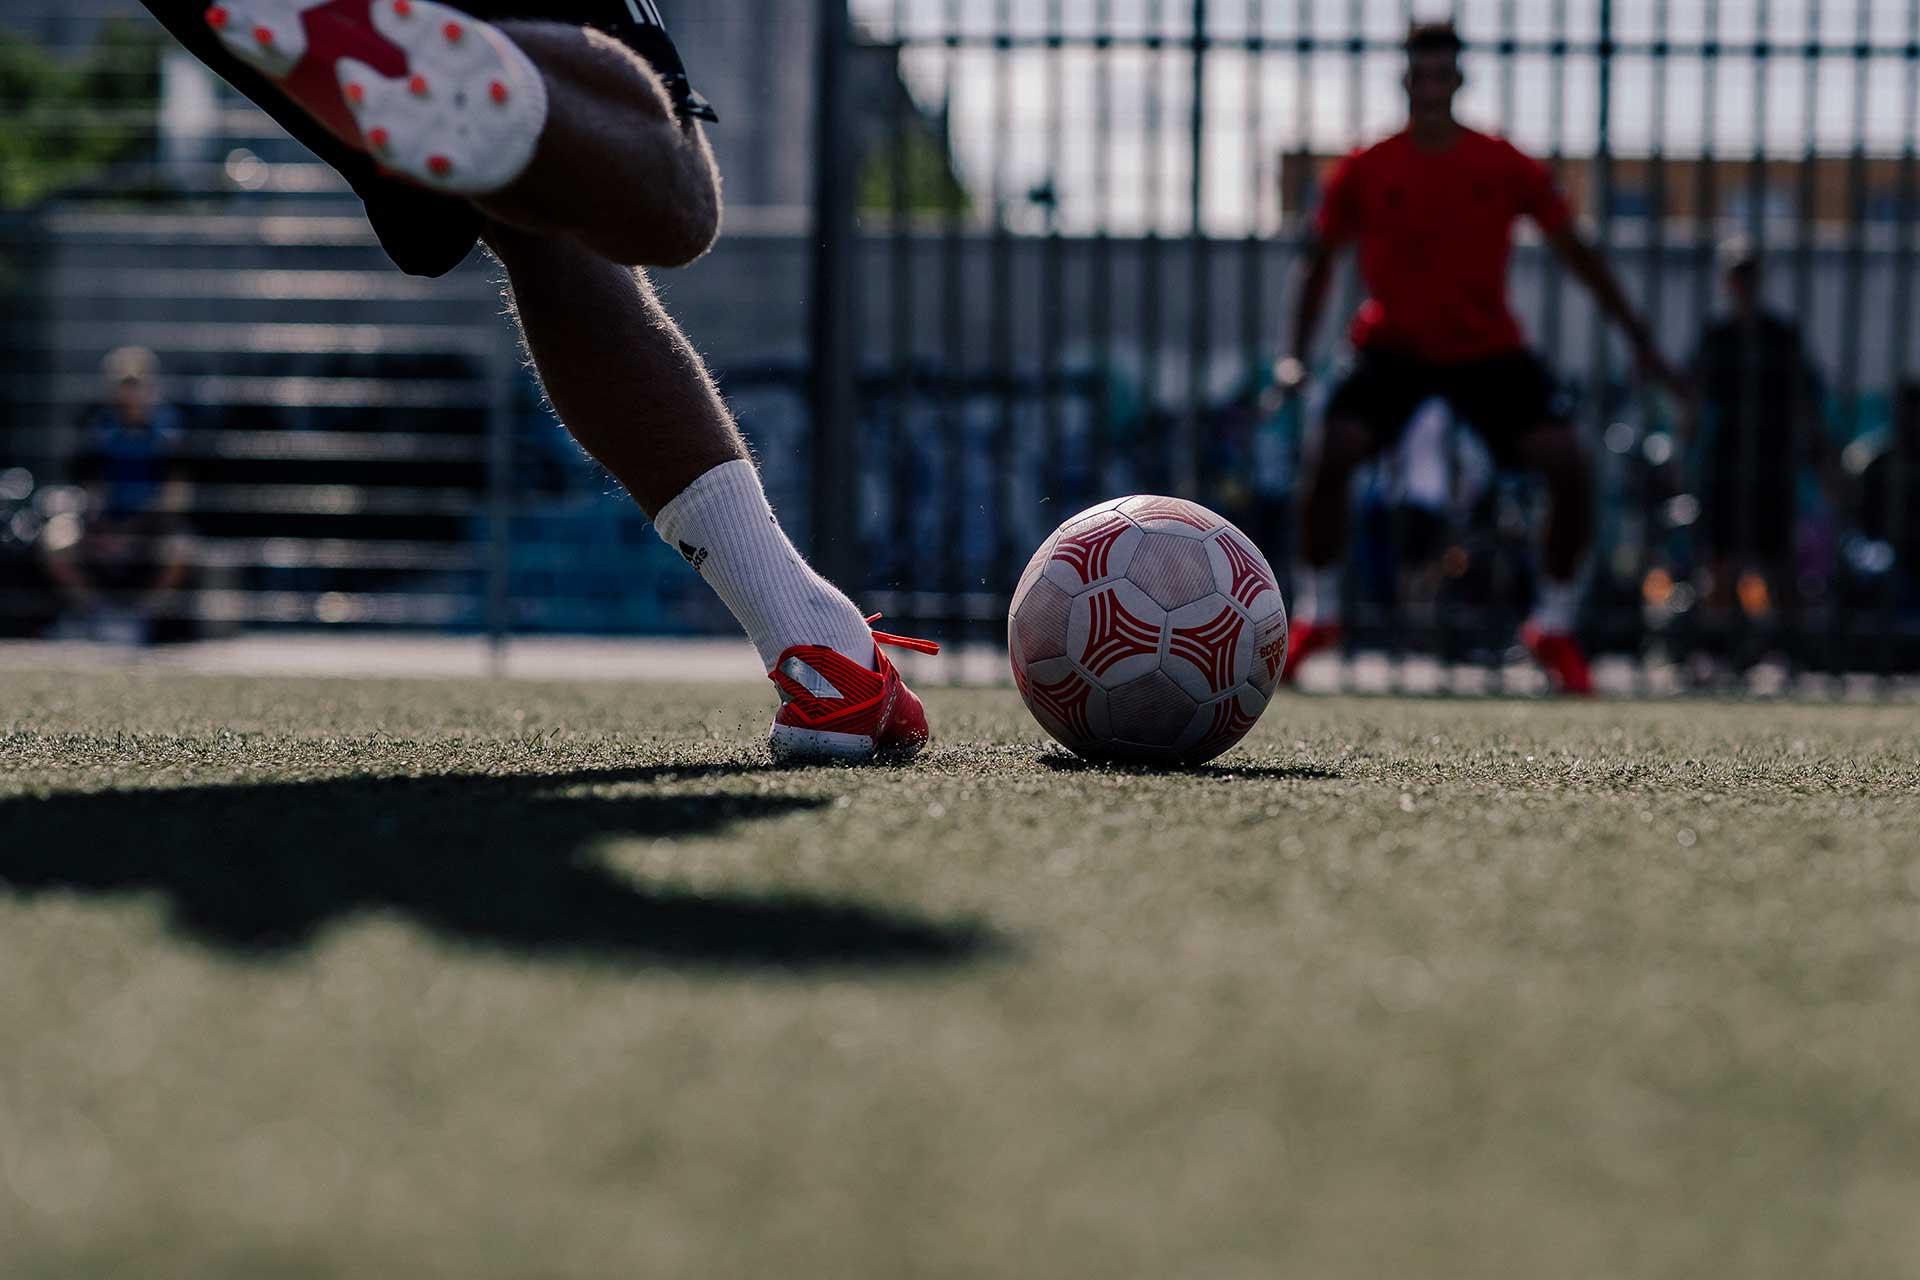 Adidas Fußball Streetsoccer Fotograf Michal Müller Sport Hamburg